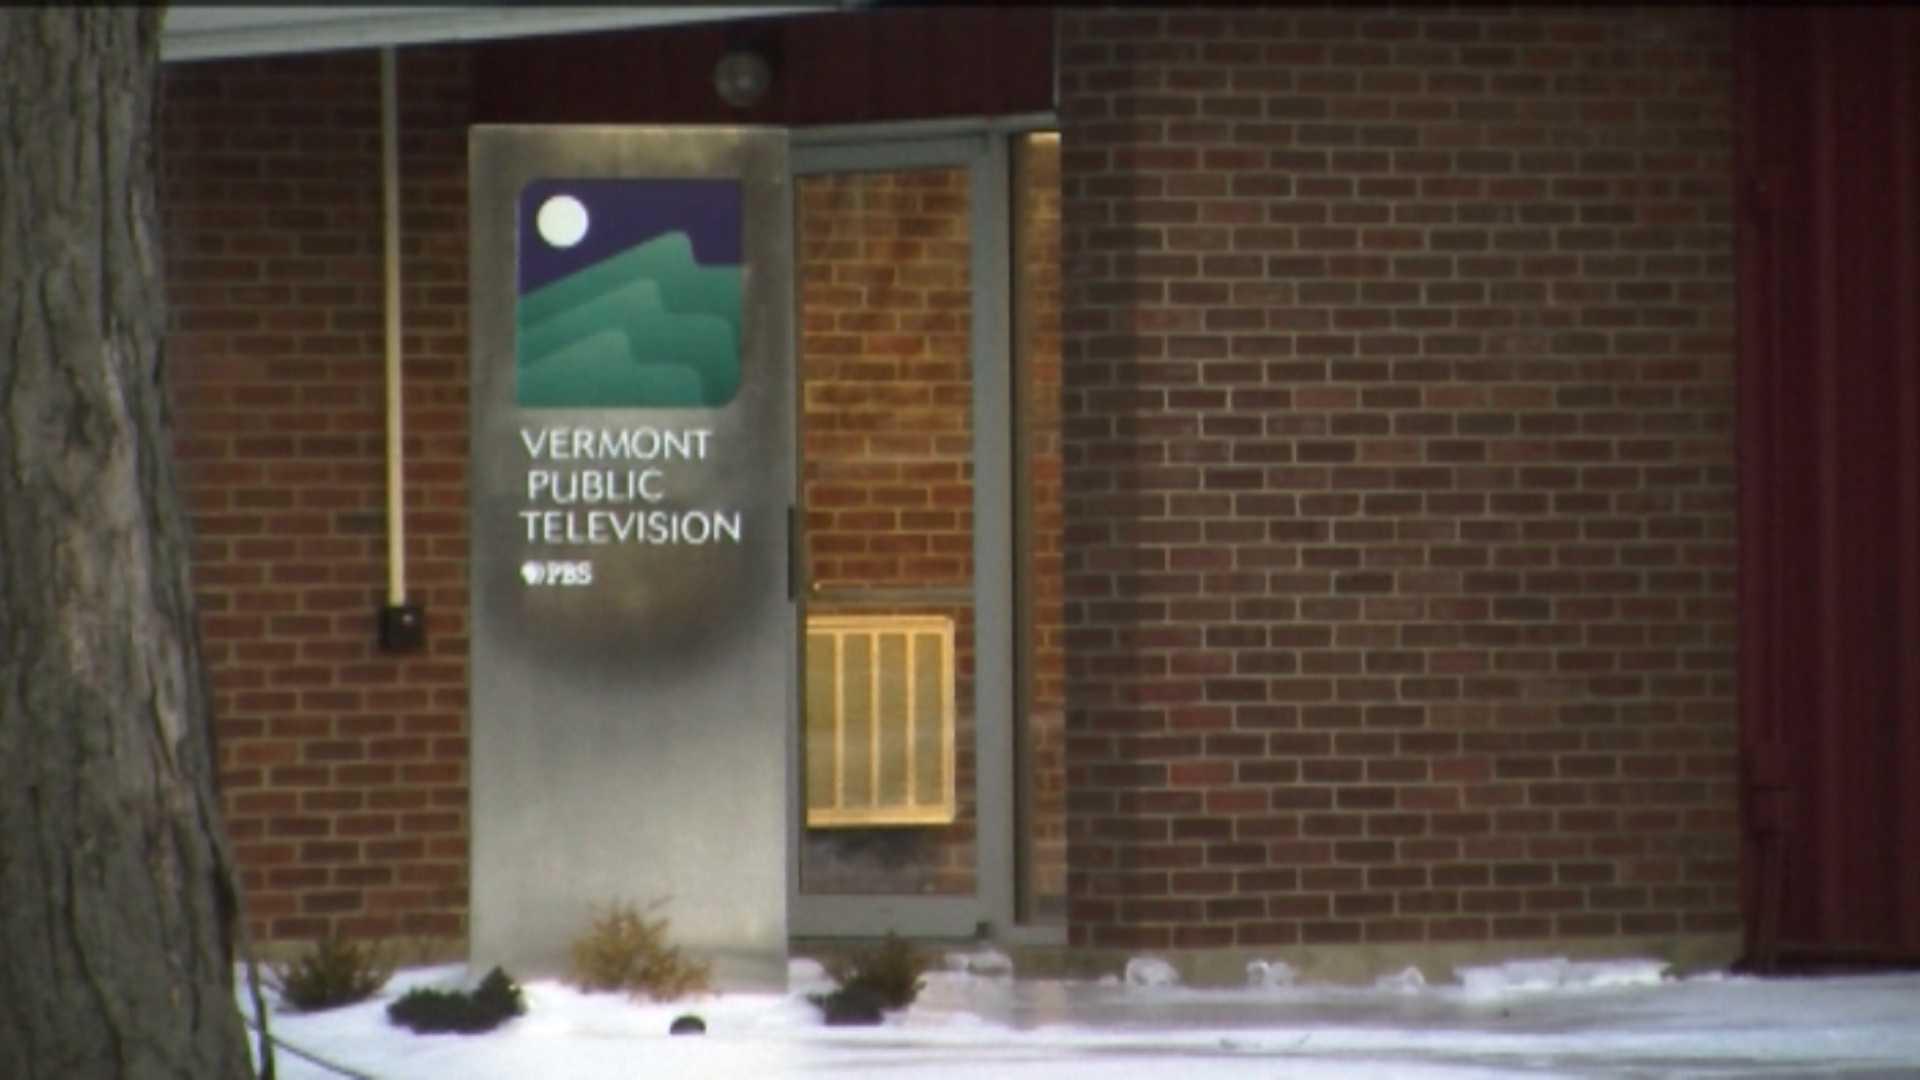 1-9-14 2nd VPT board member resigns - img